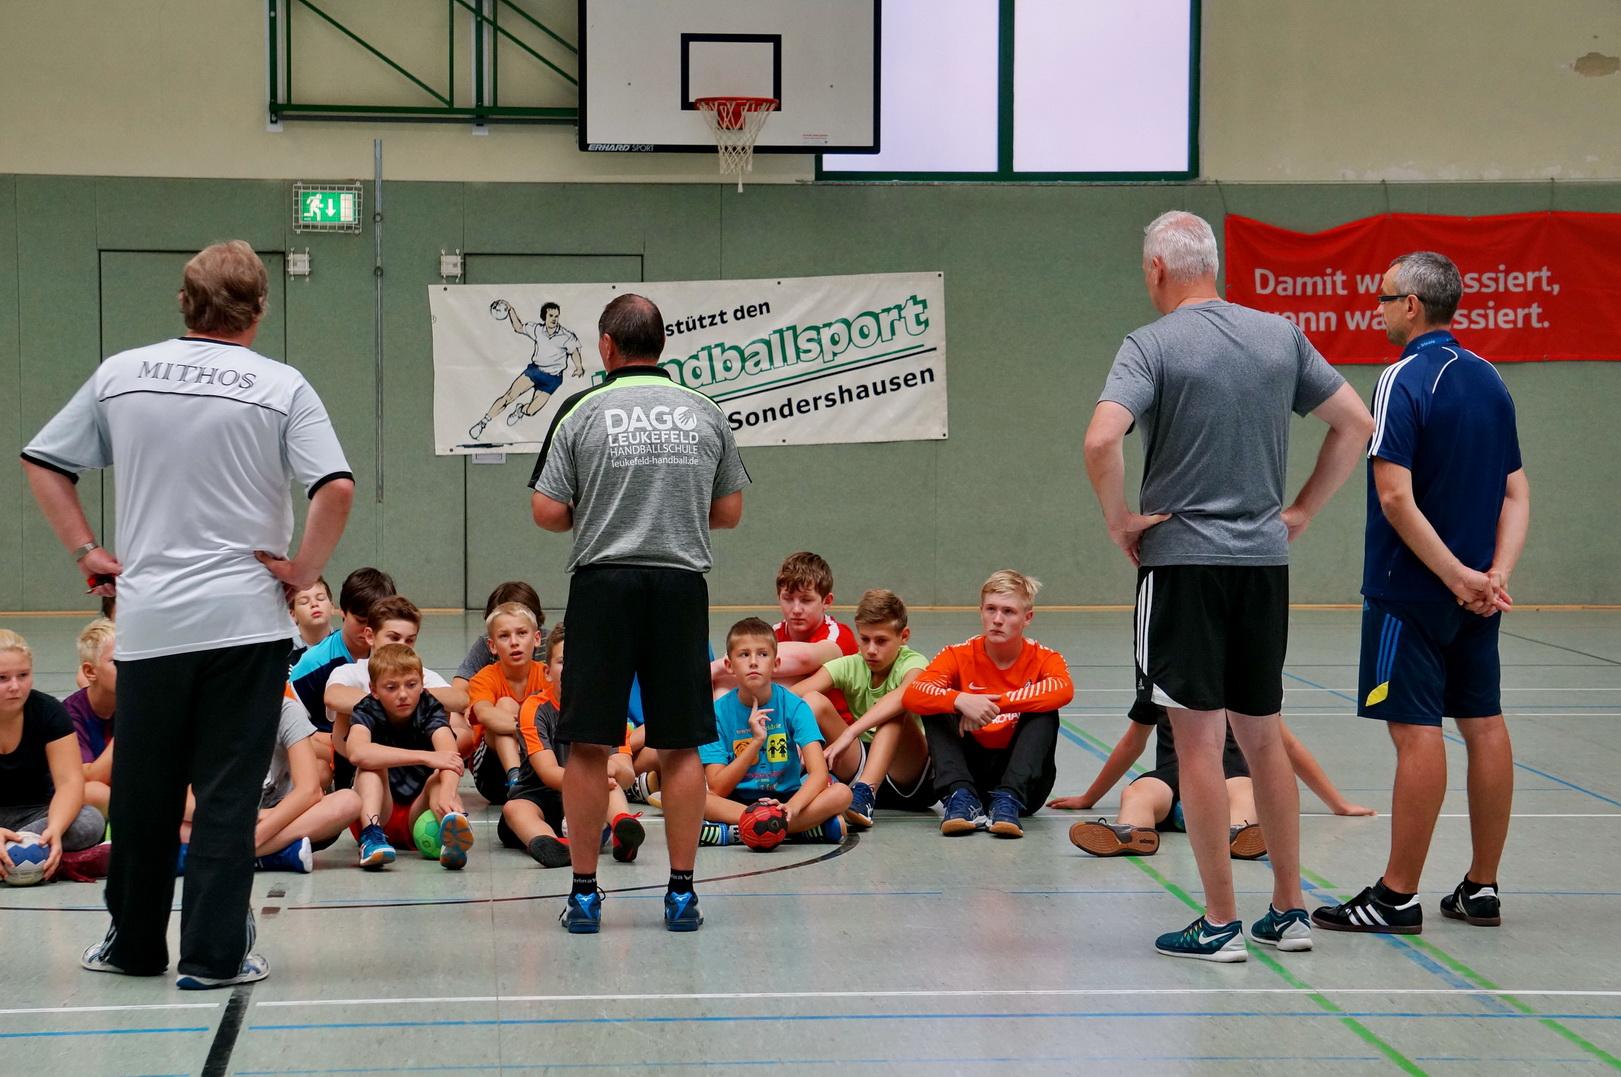 201808_Handballcamp_SDH_MG_016w